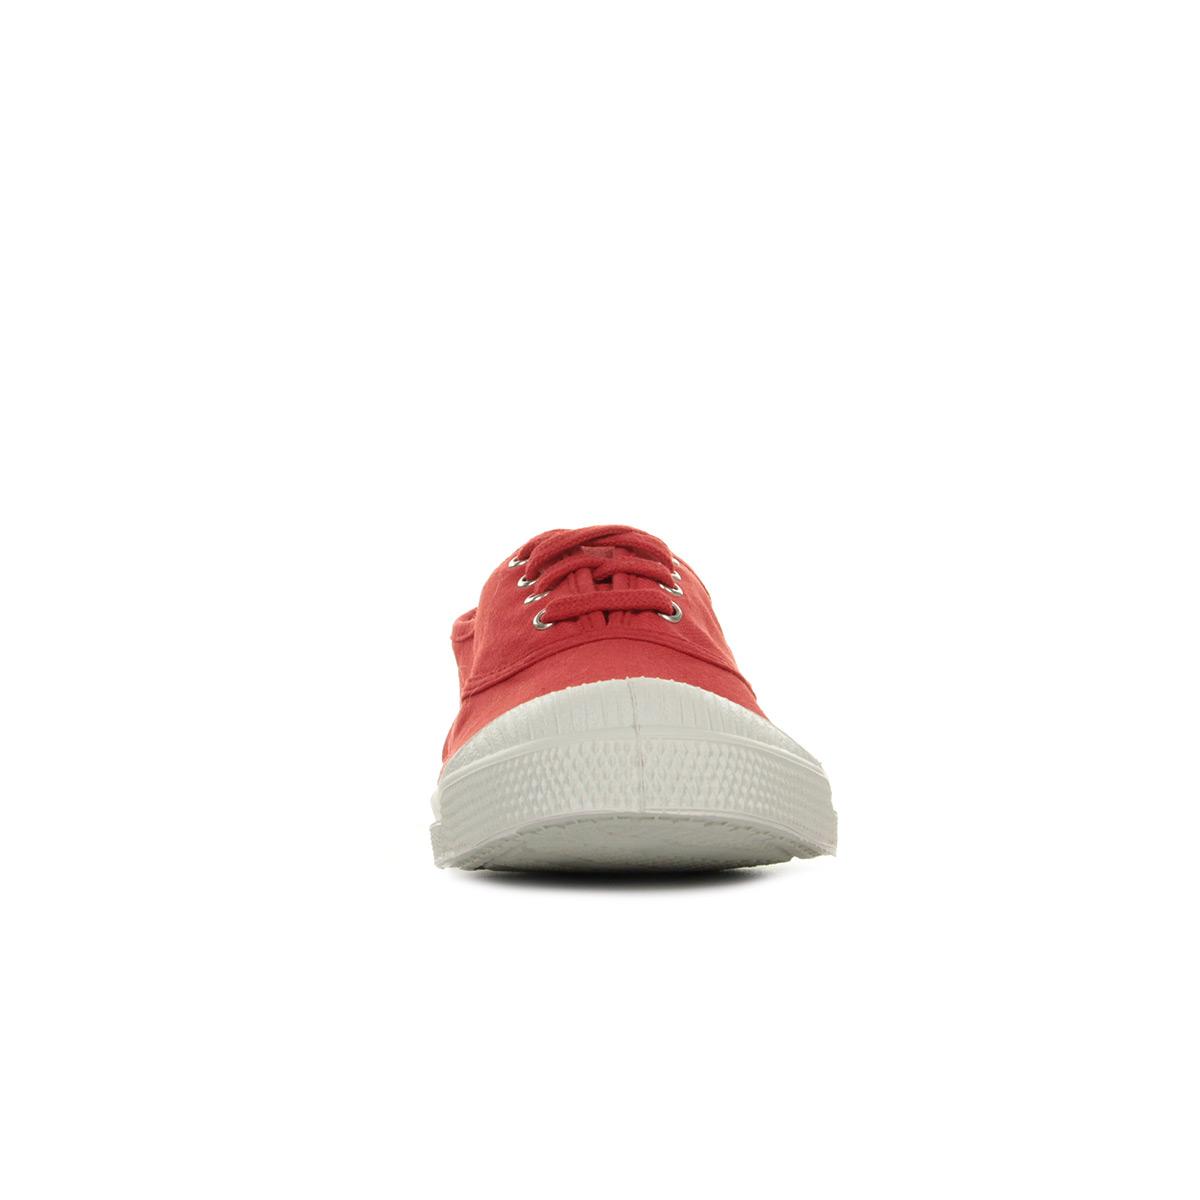 Rouge Mode Lacet Femme Tennis Bensimon F15004c15b310Baskets PiTZkwOXu